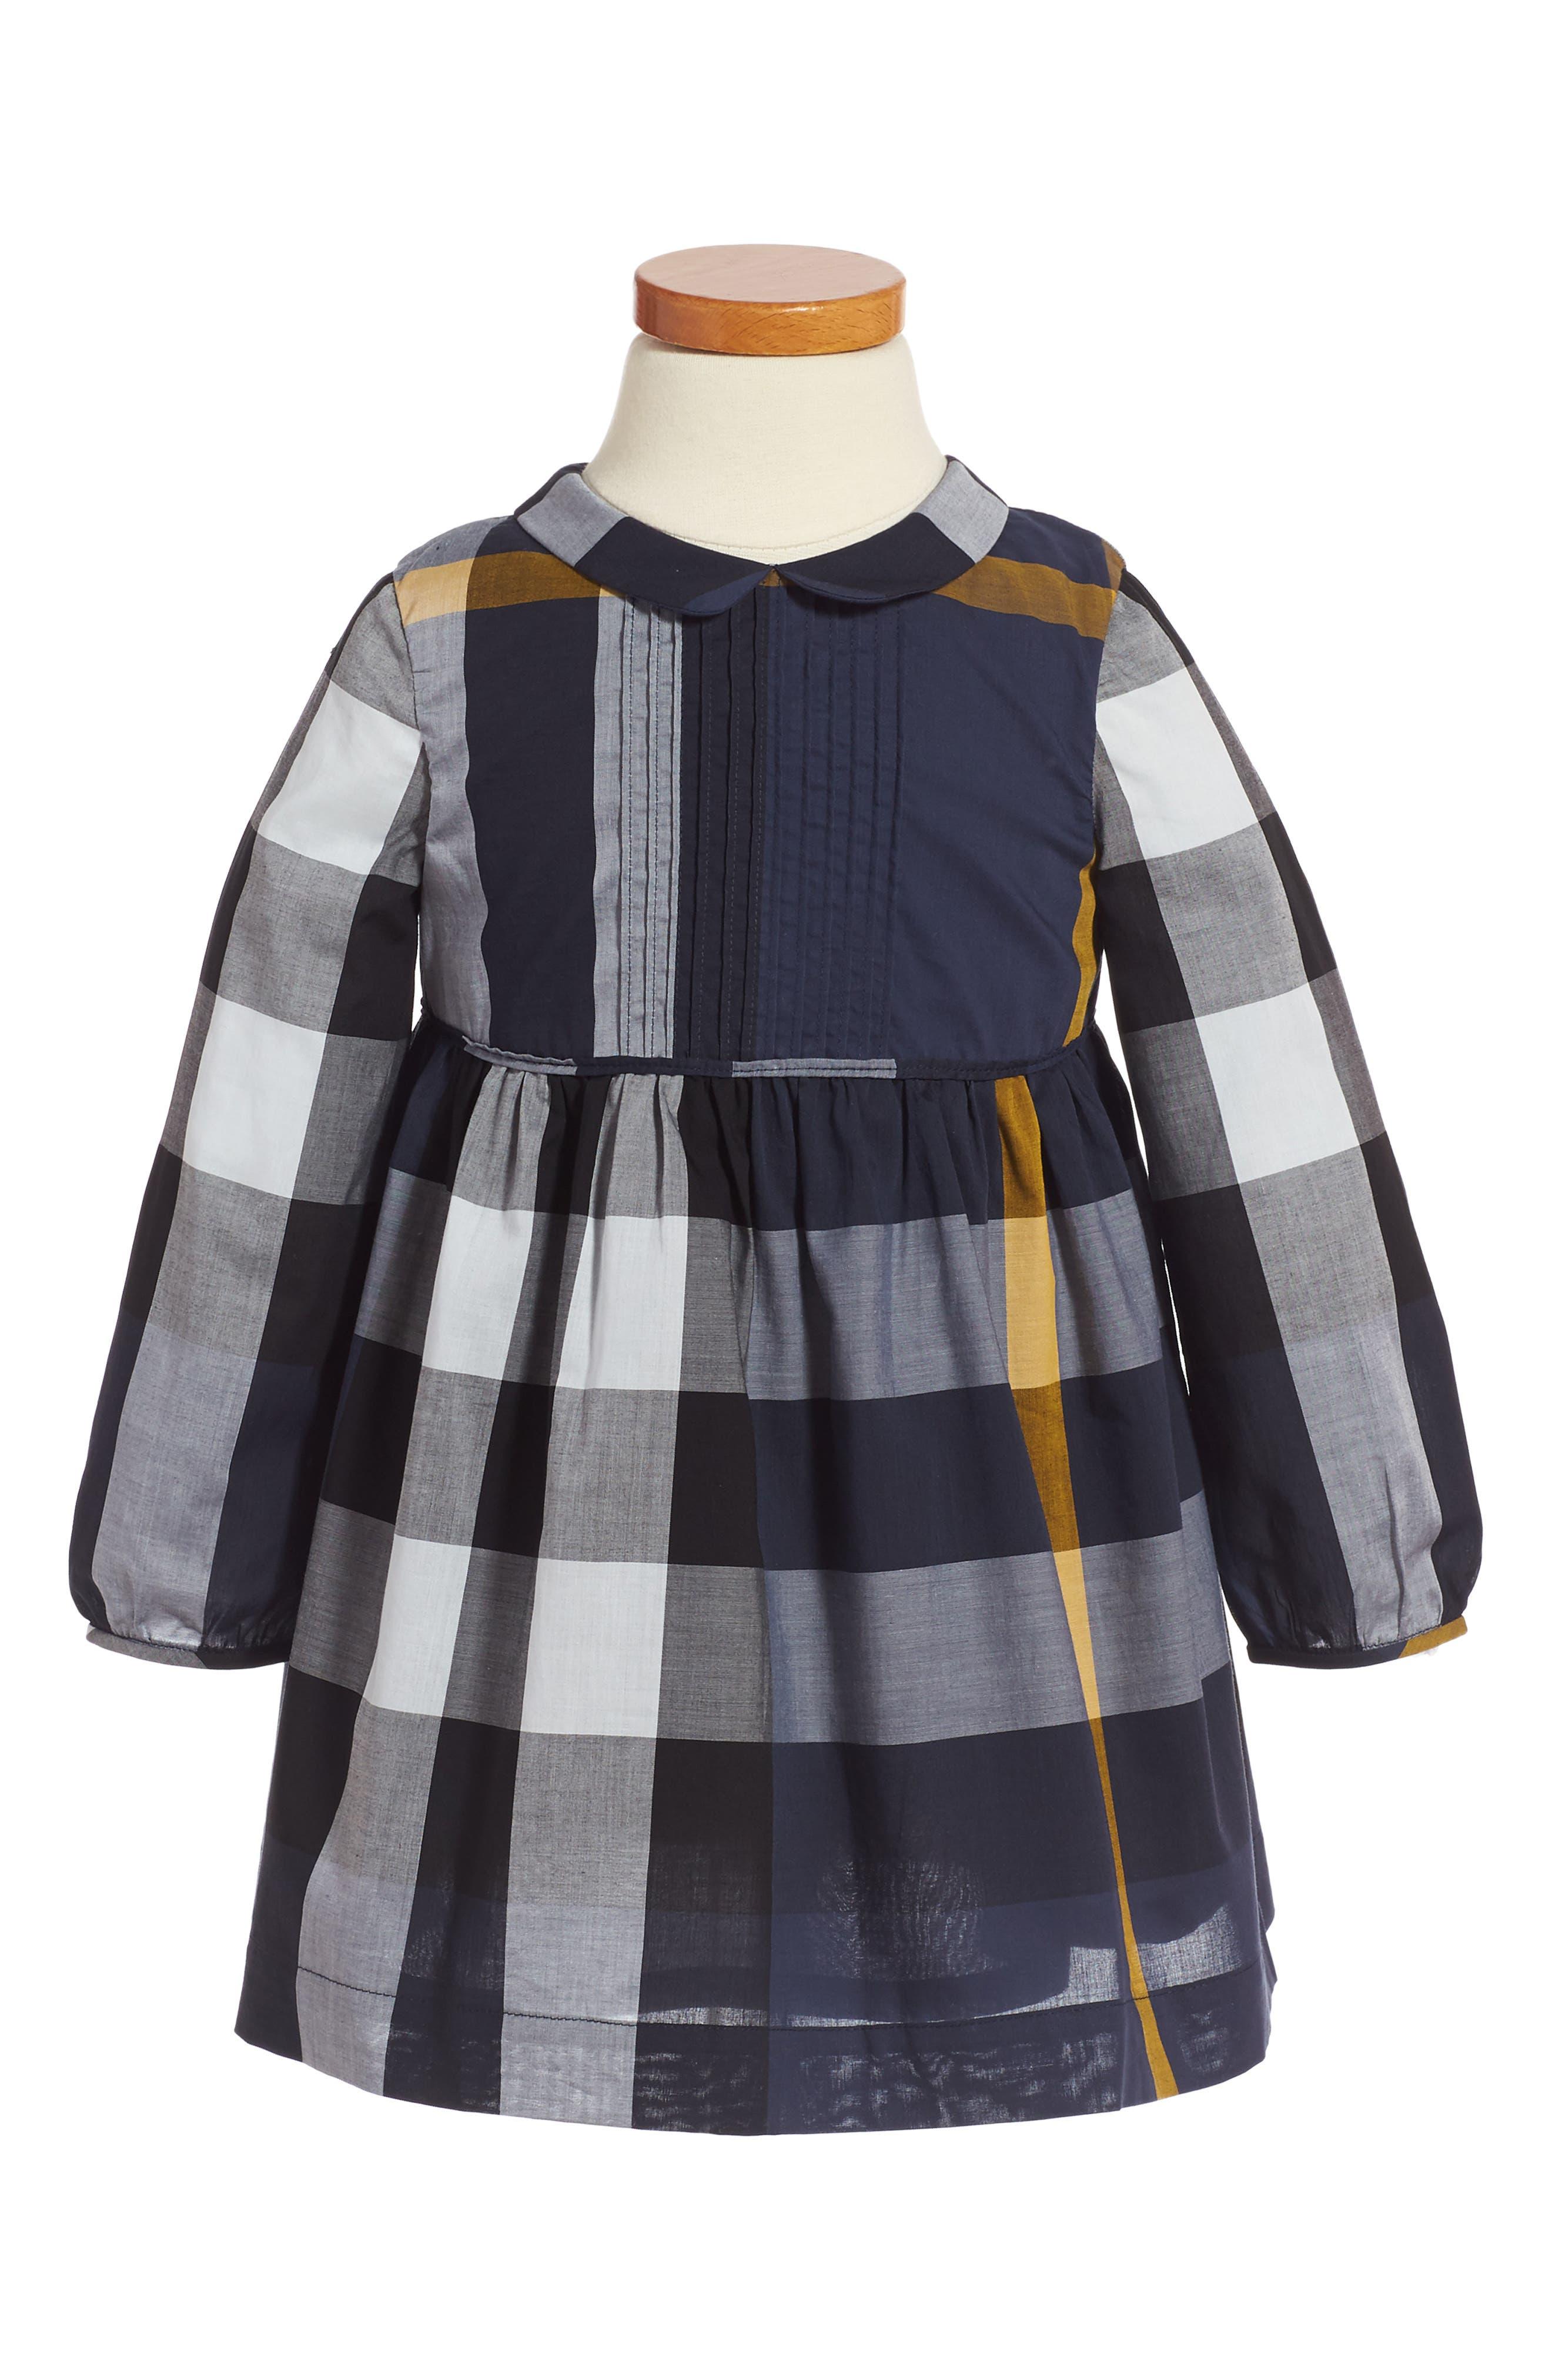 Alternate Image 1 Selected - Burberry Liza Dress (Toddler Girls)